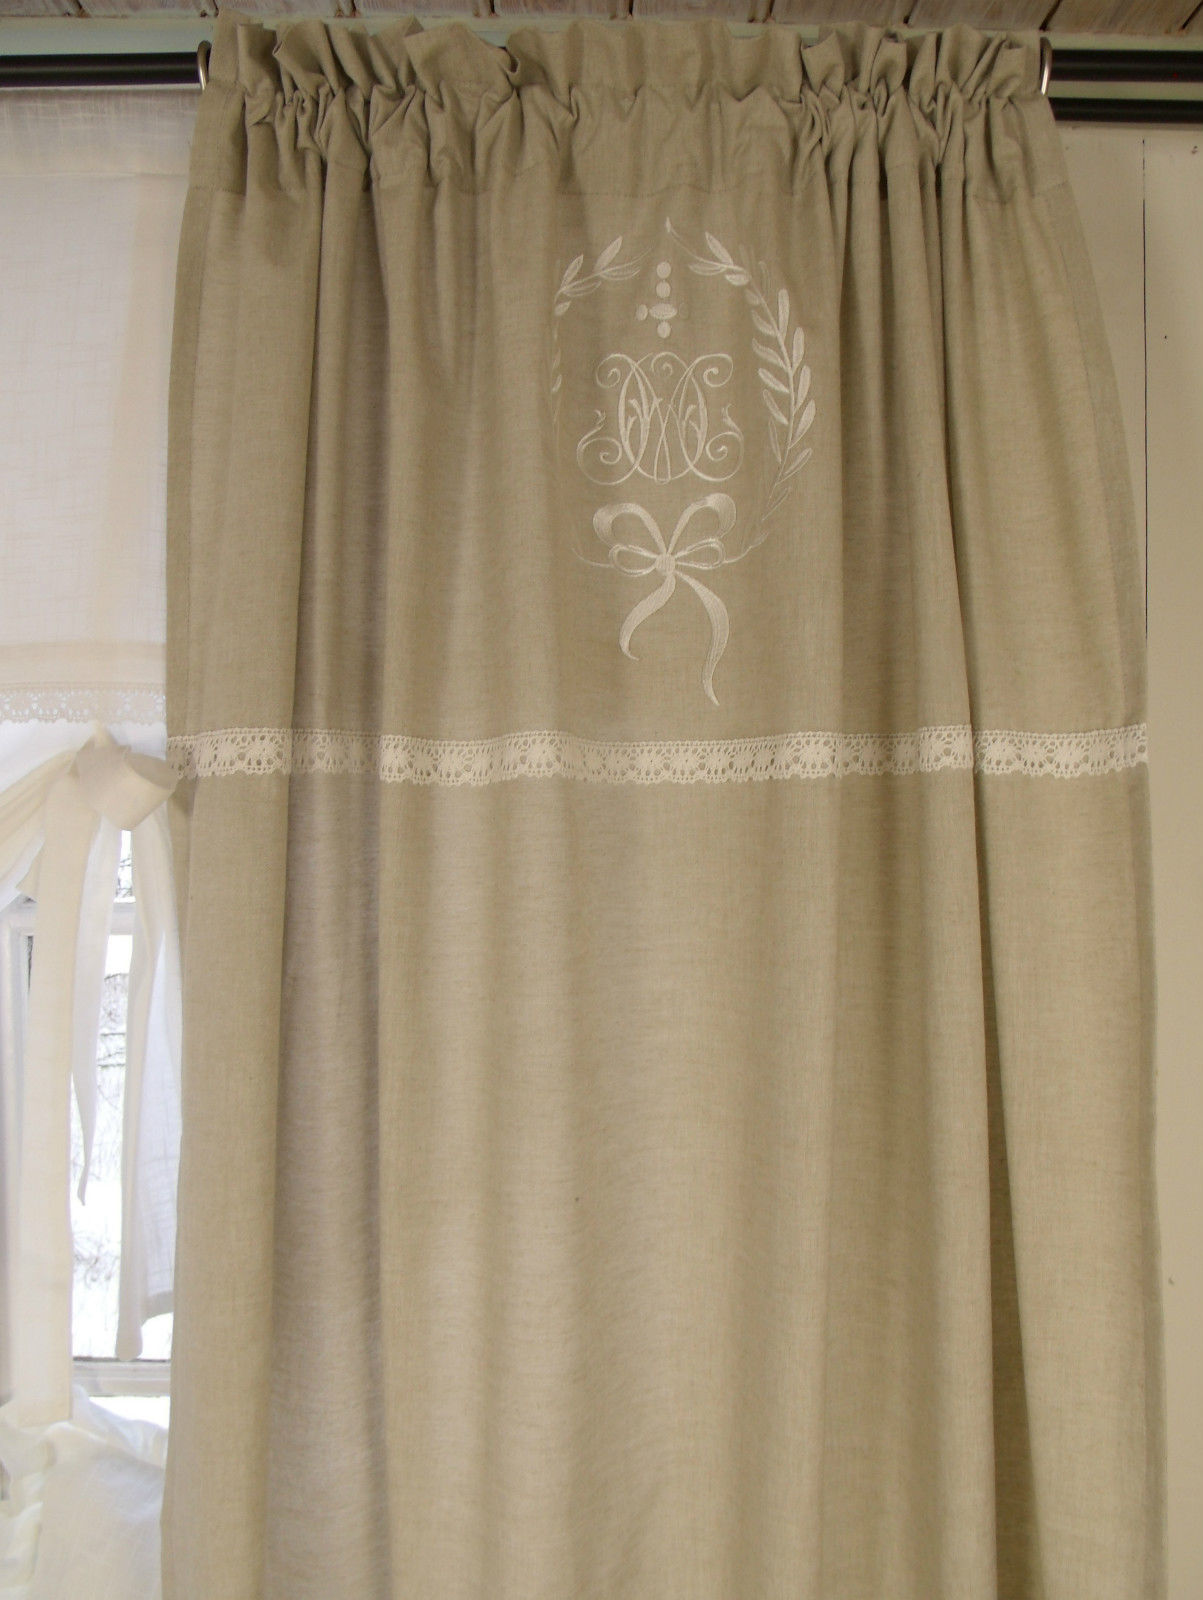 gardinen vorh nge gardinen lillabelle. Black Bedroom Furniture Sets. Home Design Ideas